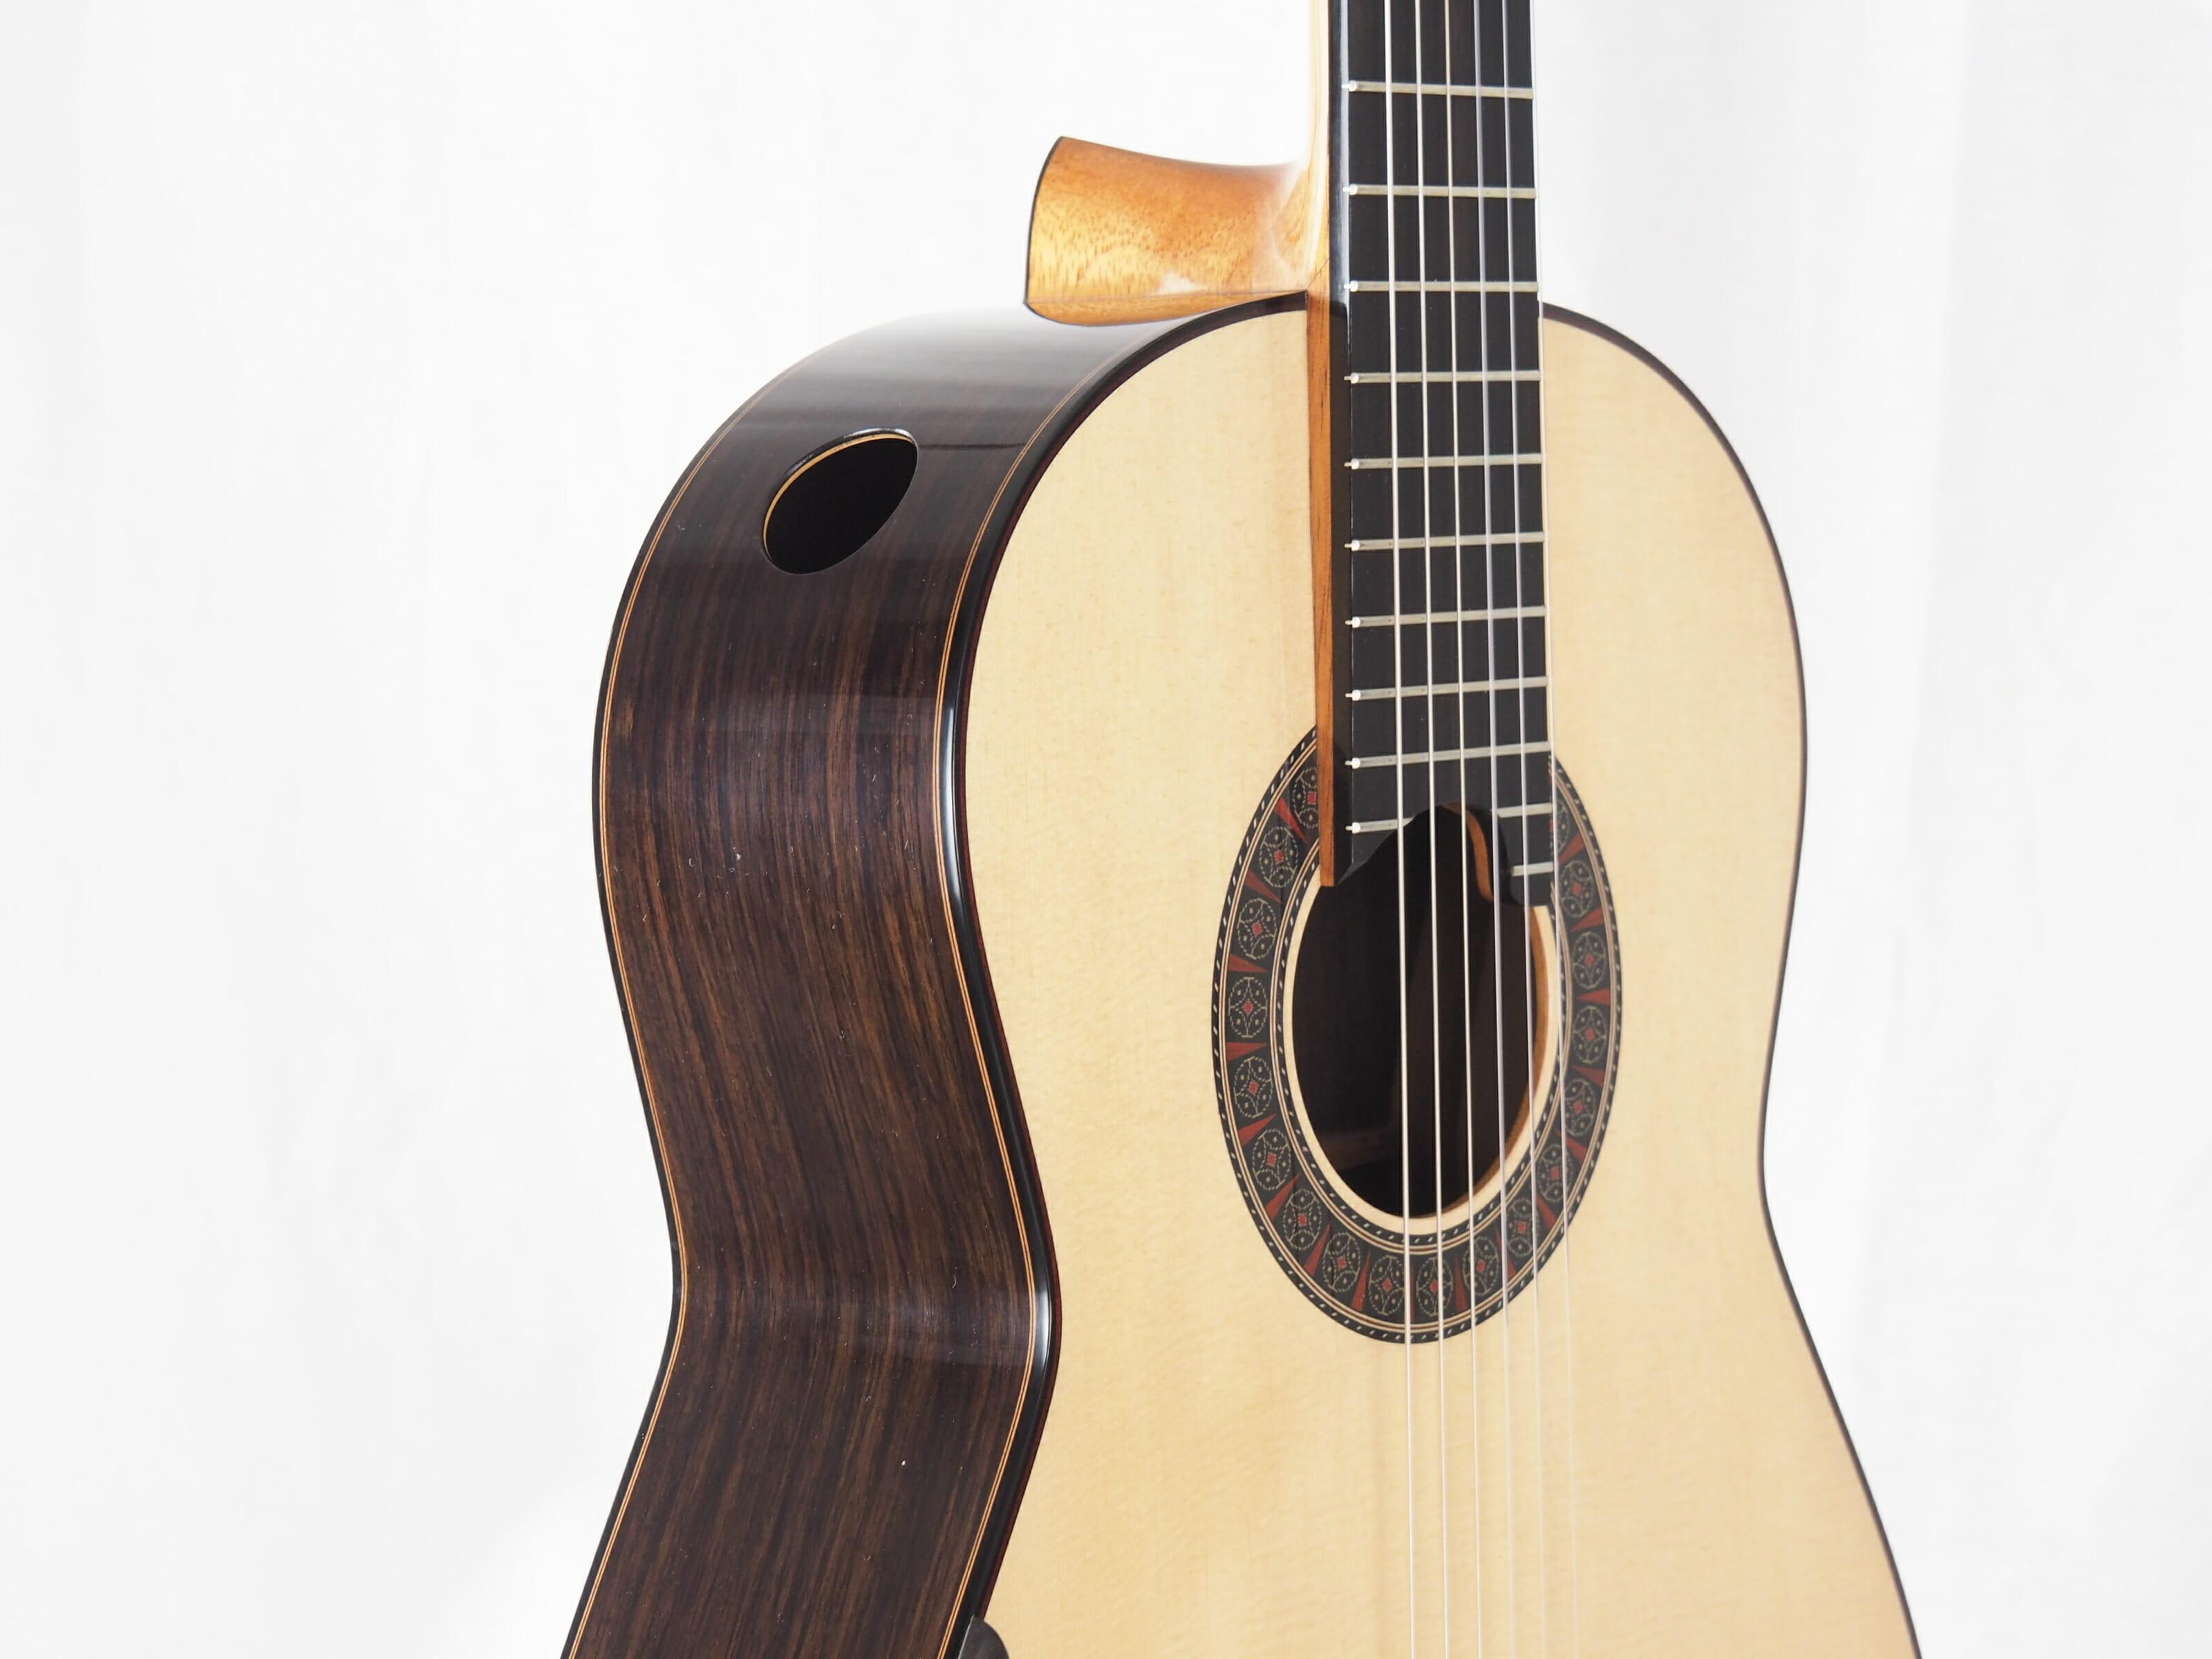 Martin Blackwell luthier guitare classique No 19BLA166-04